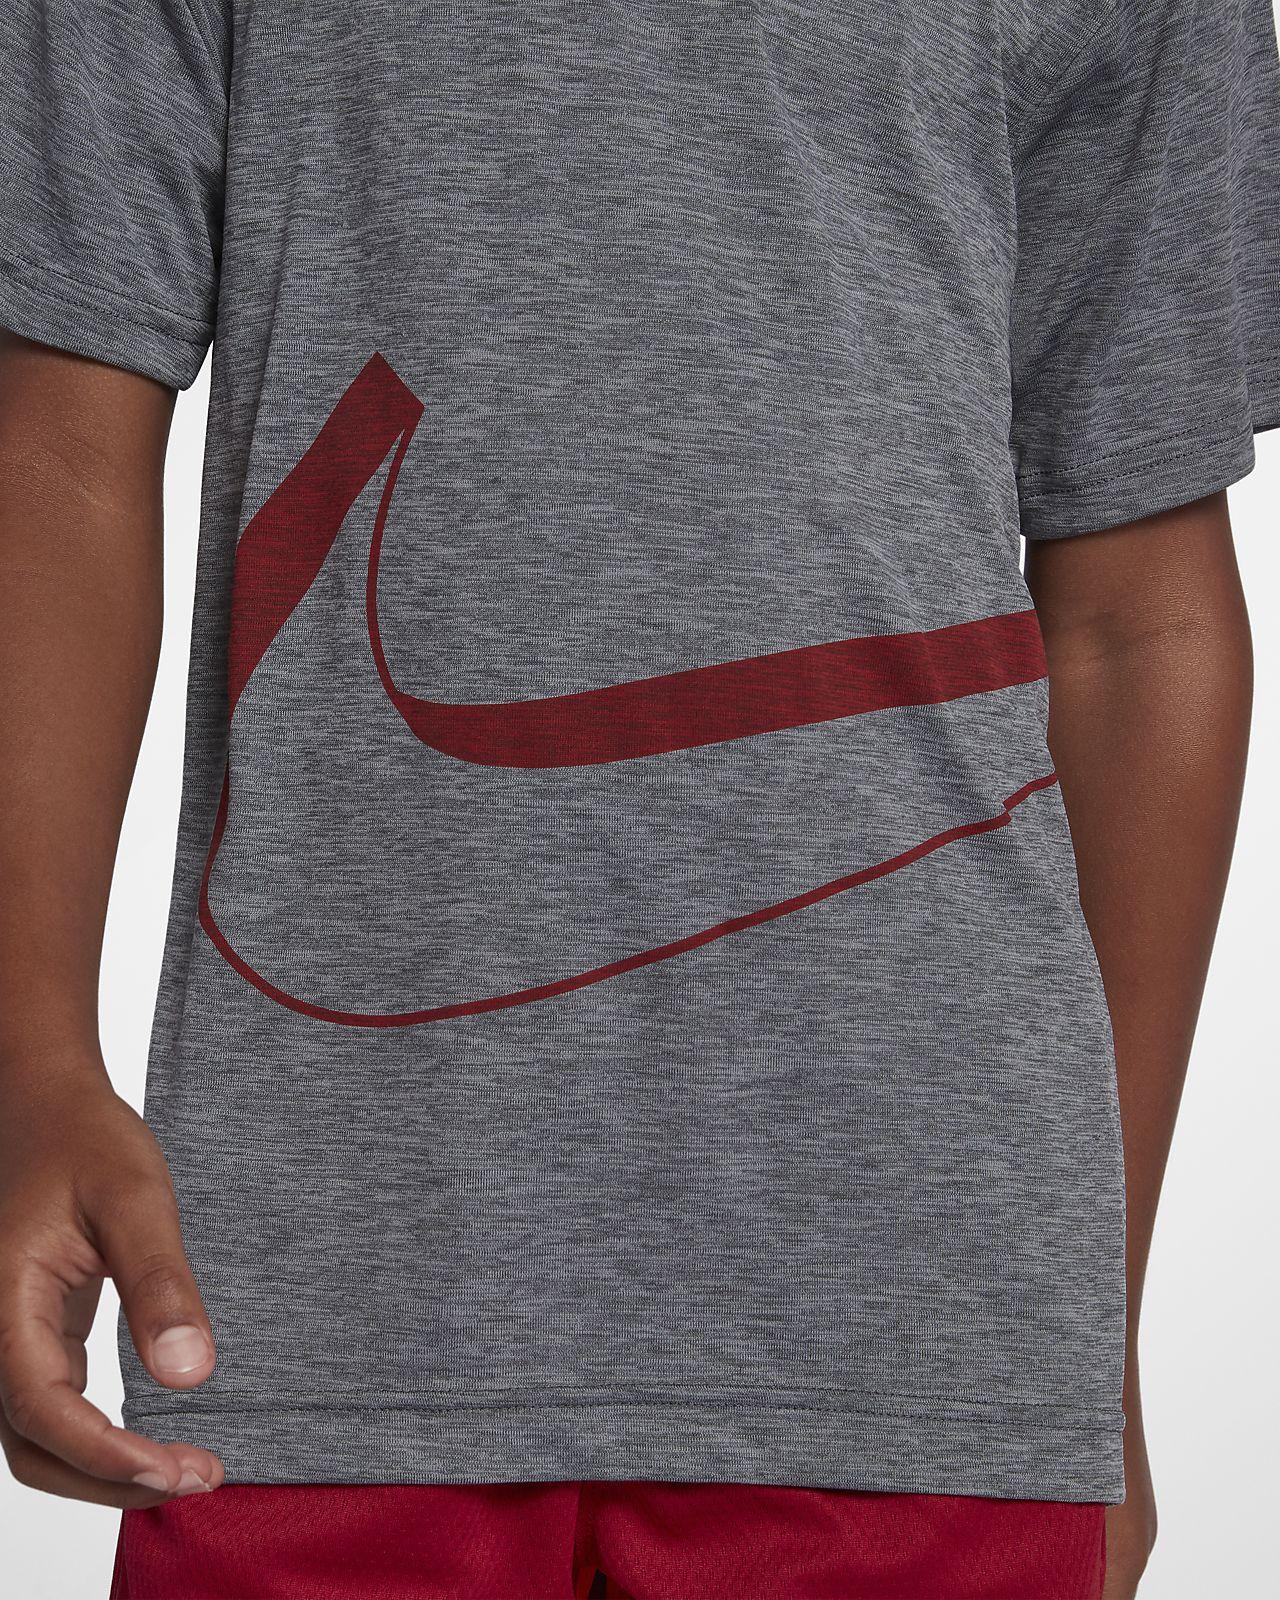 8ced17863 ... Nike Dri-FIT Breathe Big Kids' (Boys') Short Sleeve Training Top